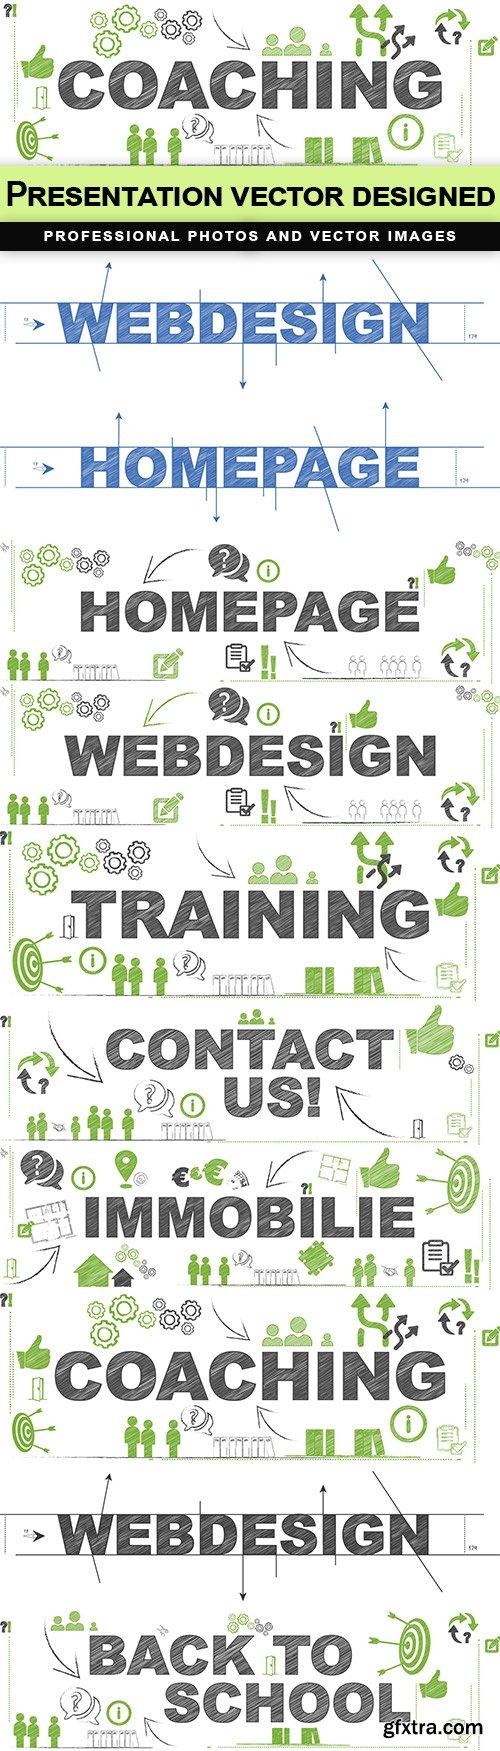 Presentation vector designed